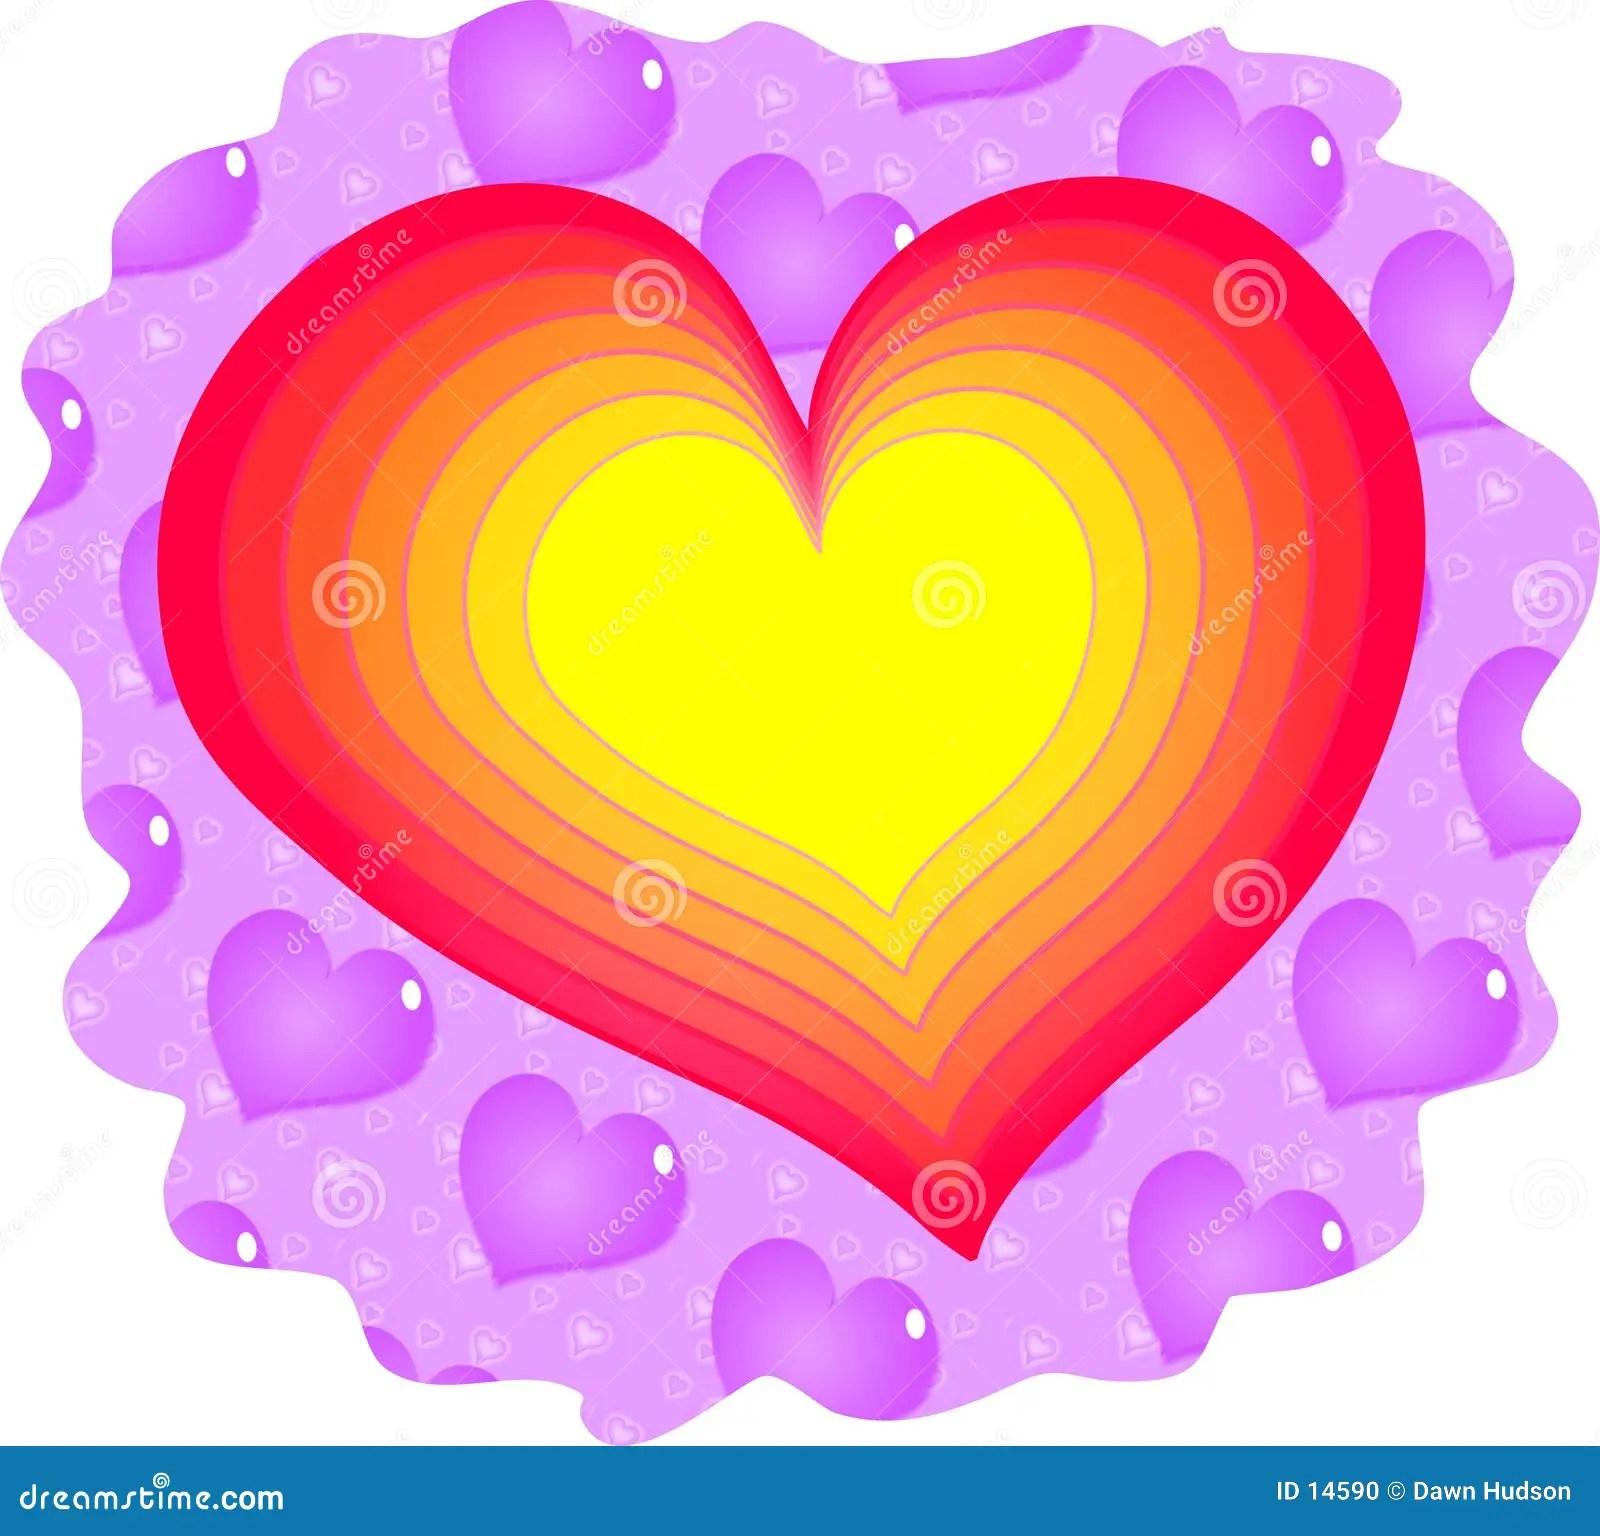 hight resolution of love heart